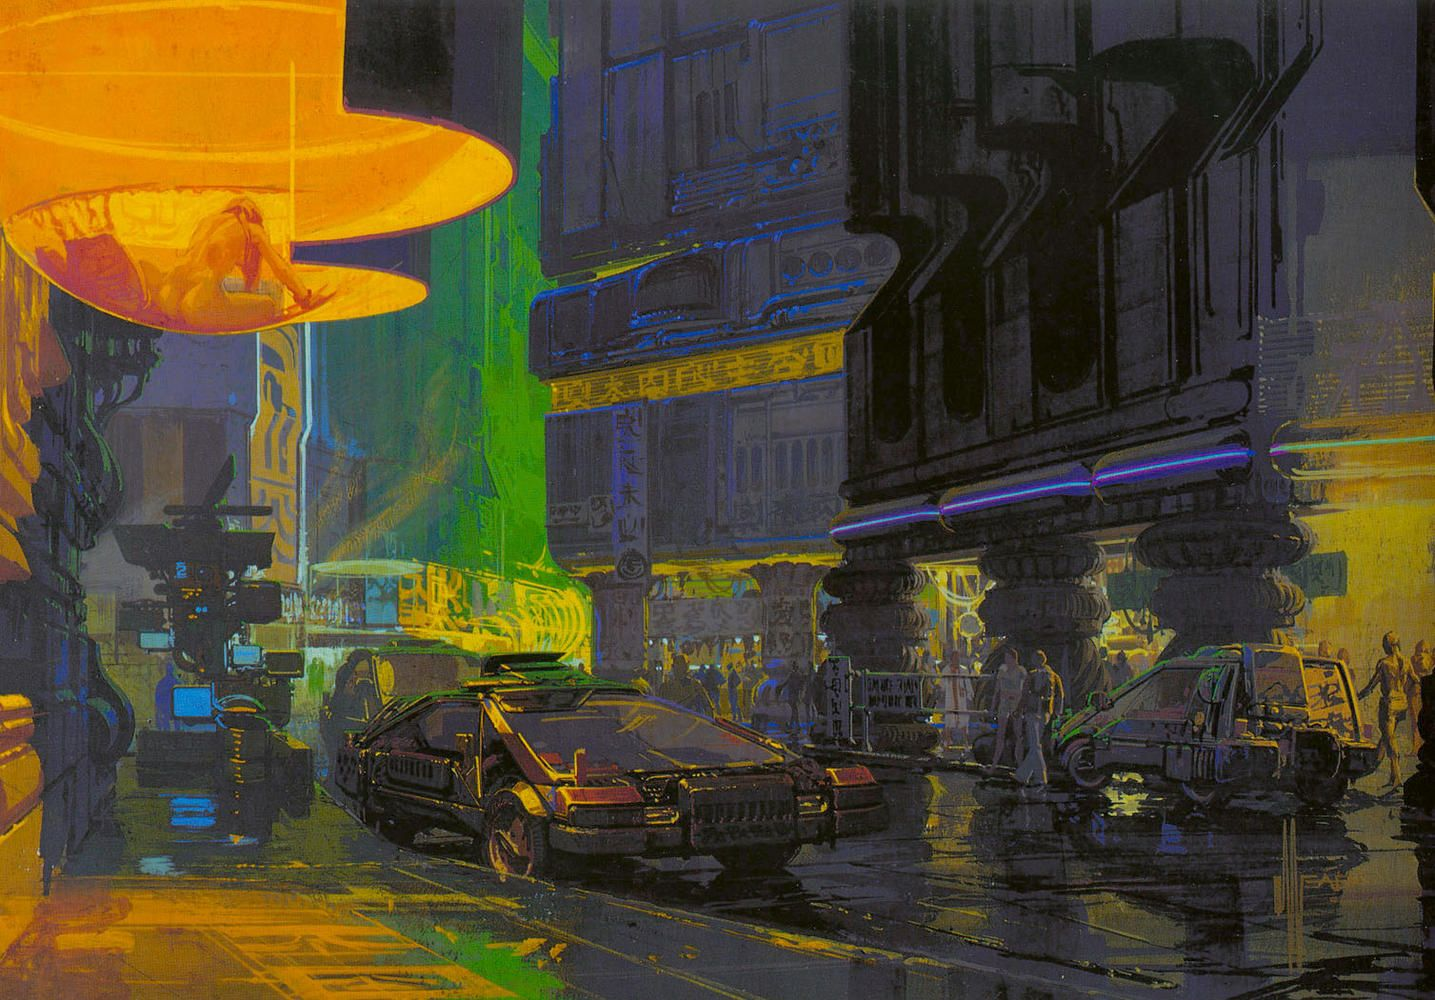 Syd Mead - Blade Runner concept art